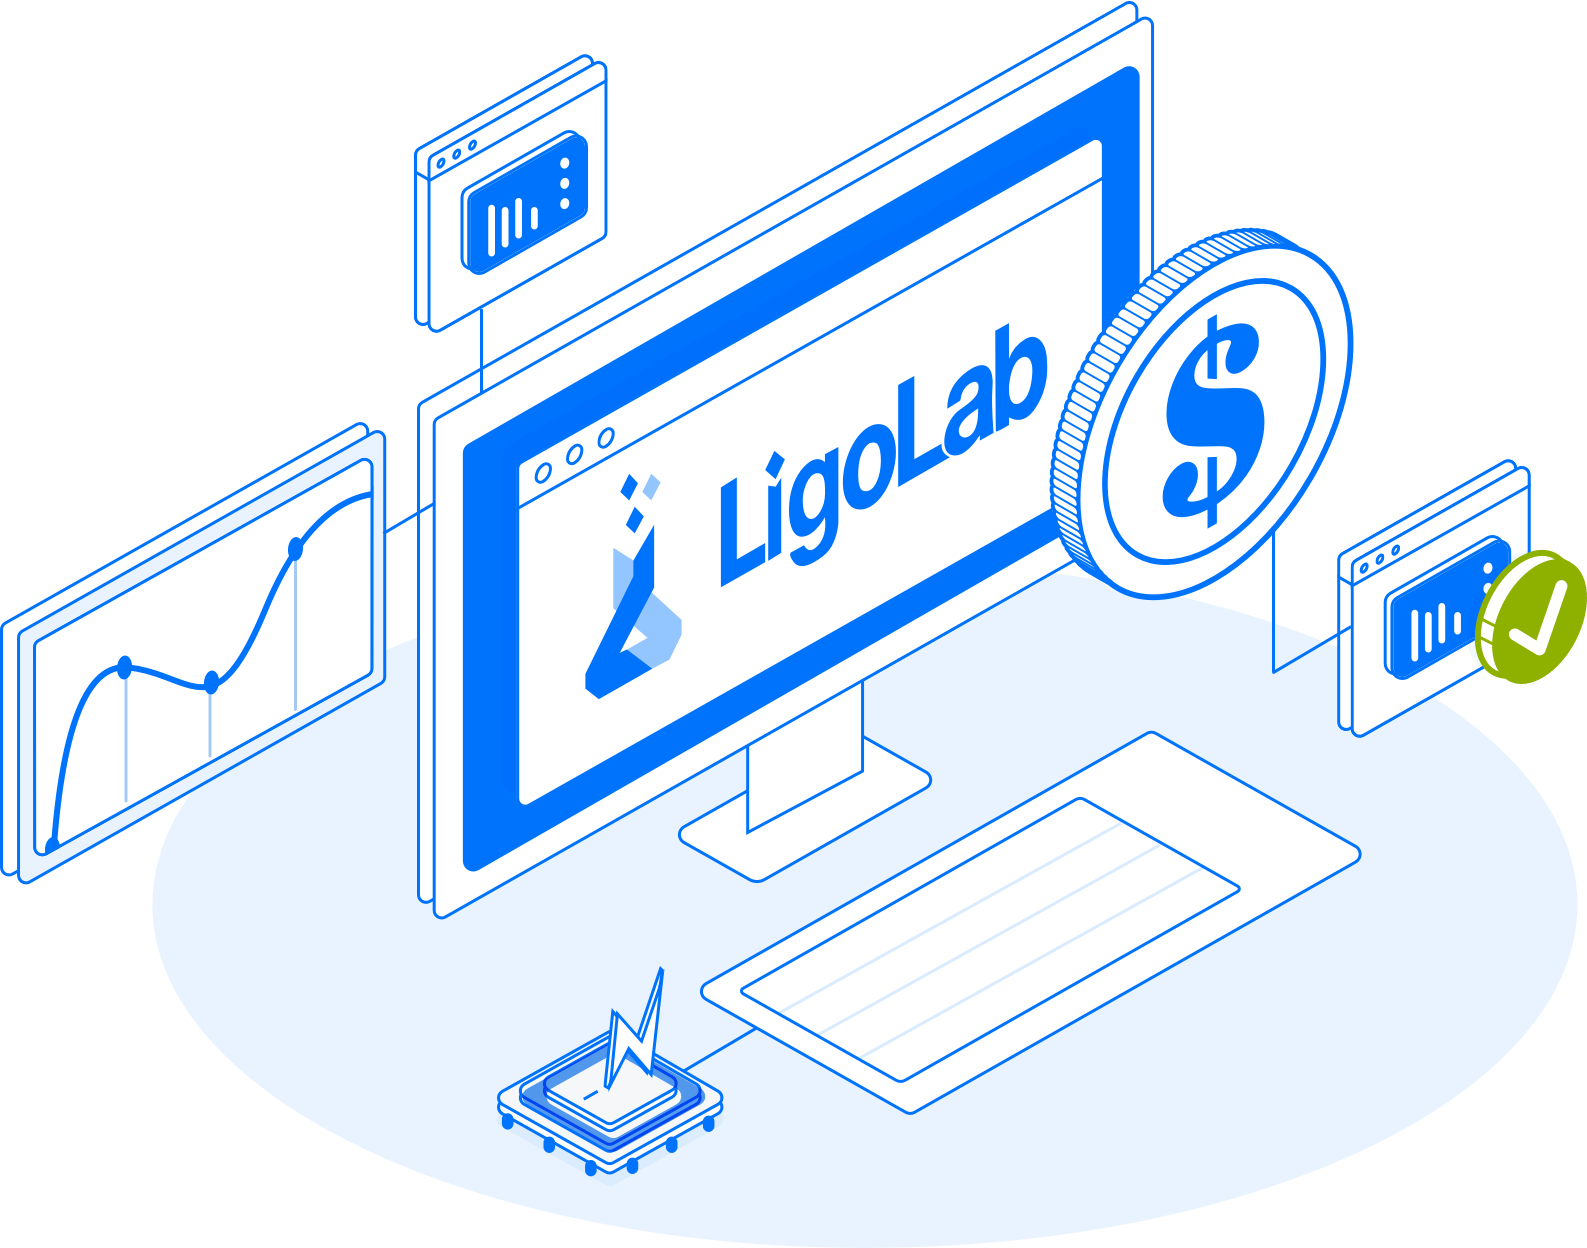 LingoLab image